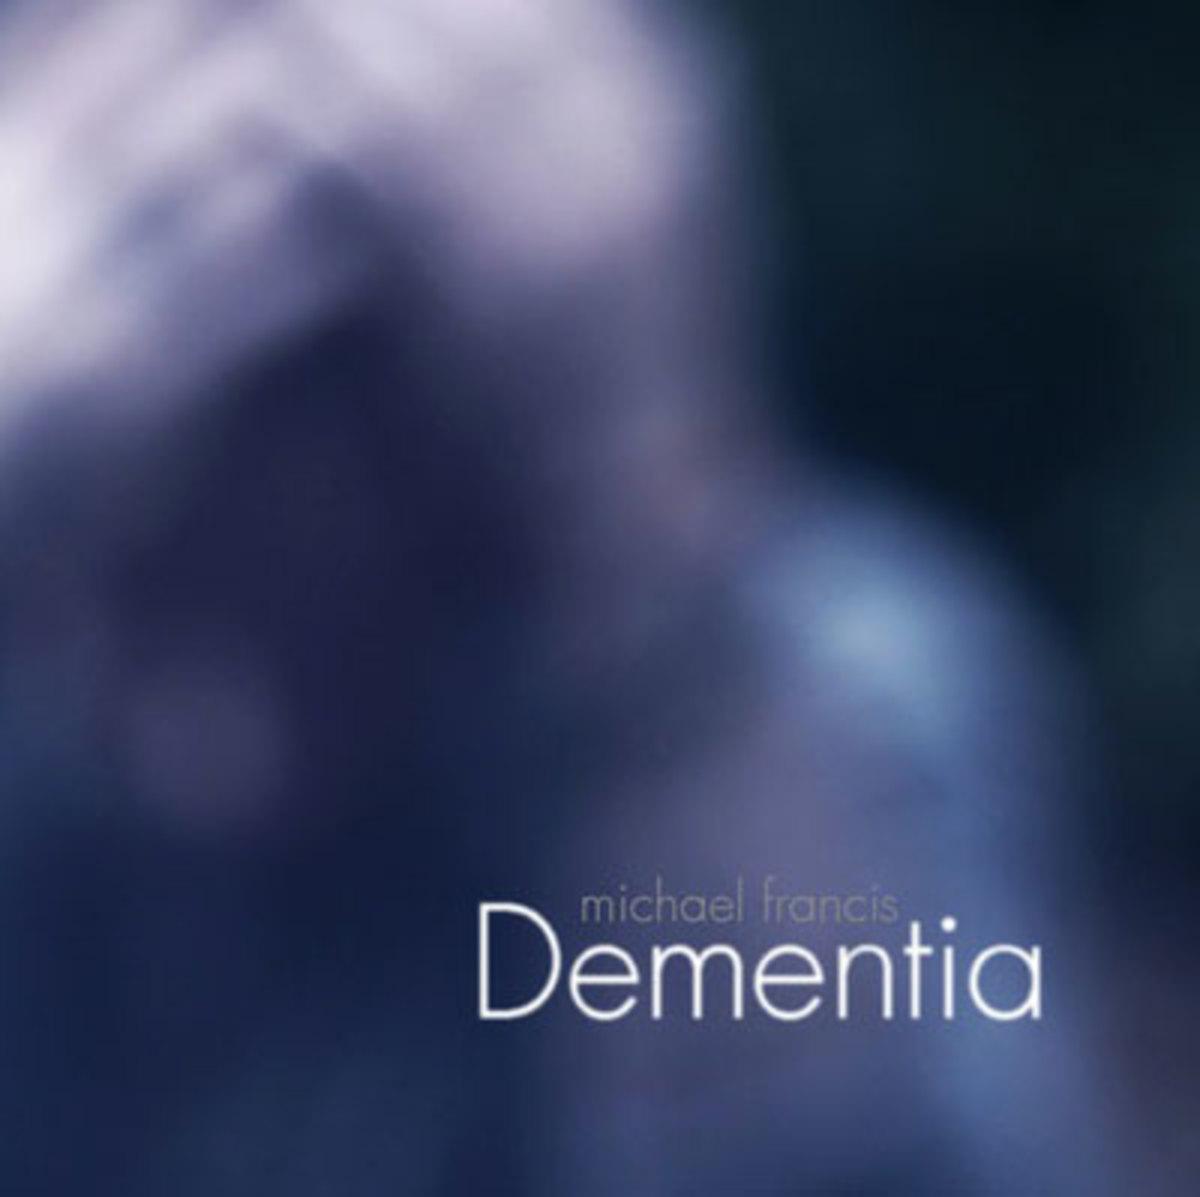 michaelfrancis-dementia.jpg